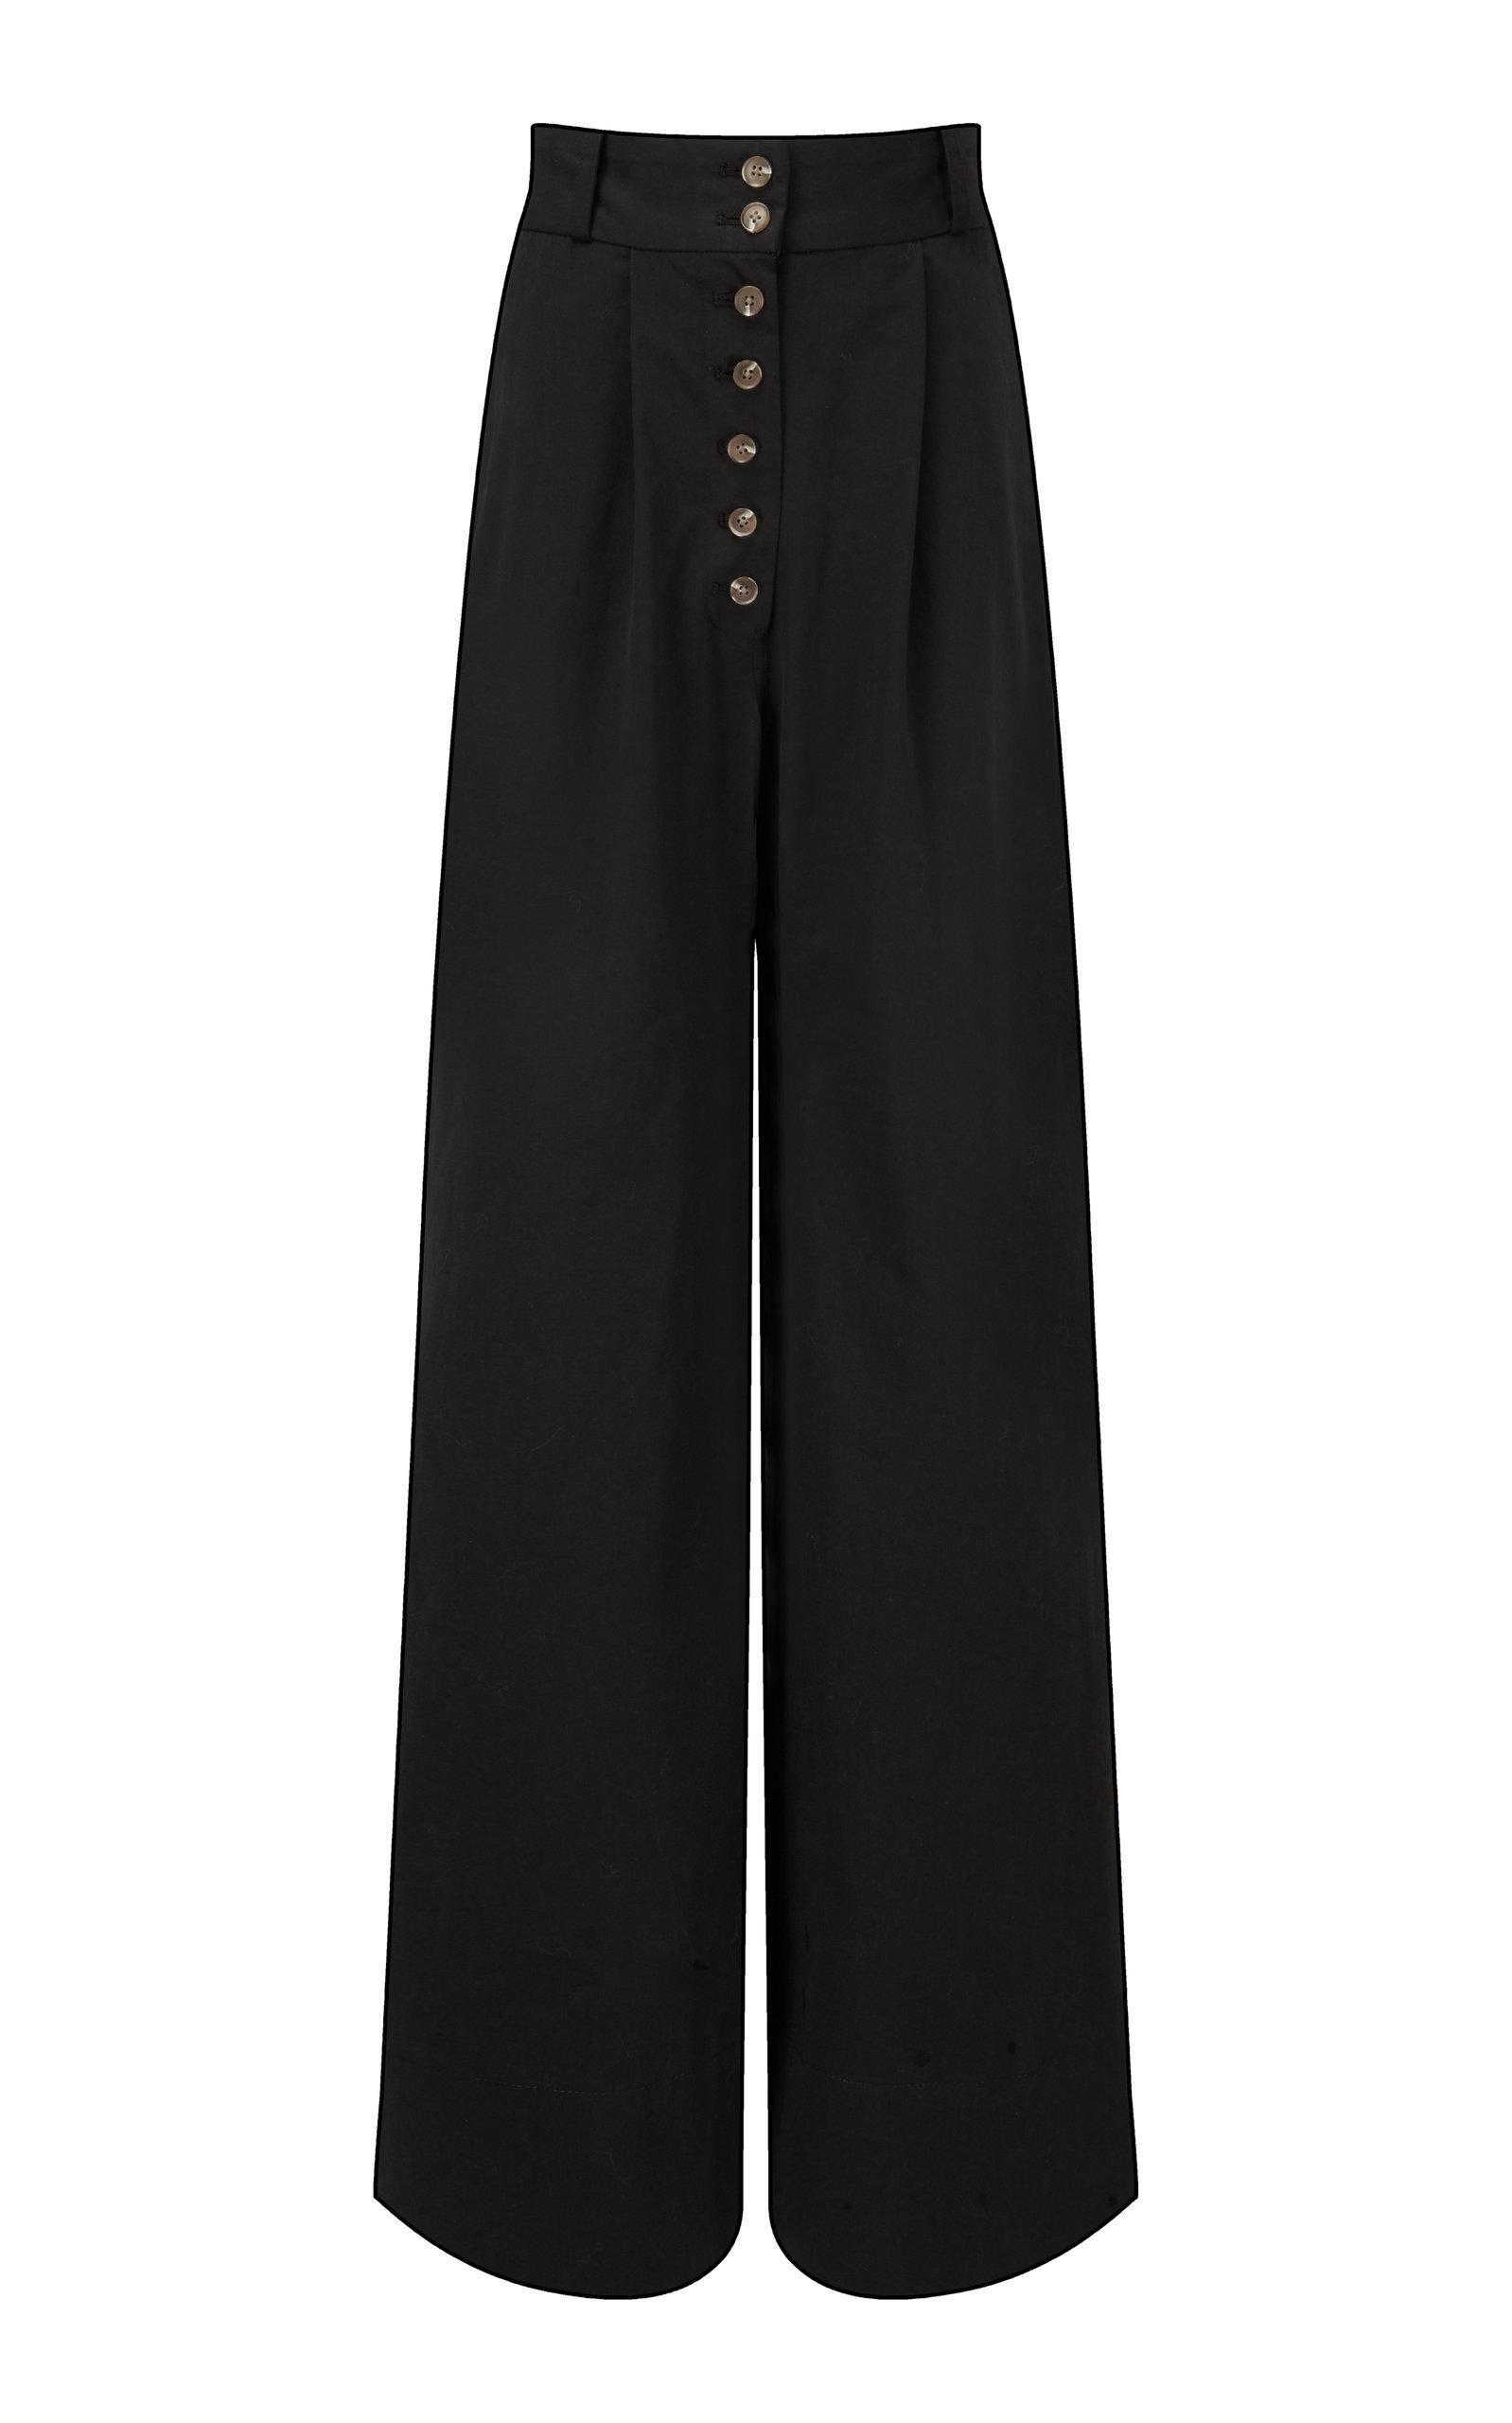 Women's Cotton Twill Wide-Leg Pants